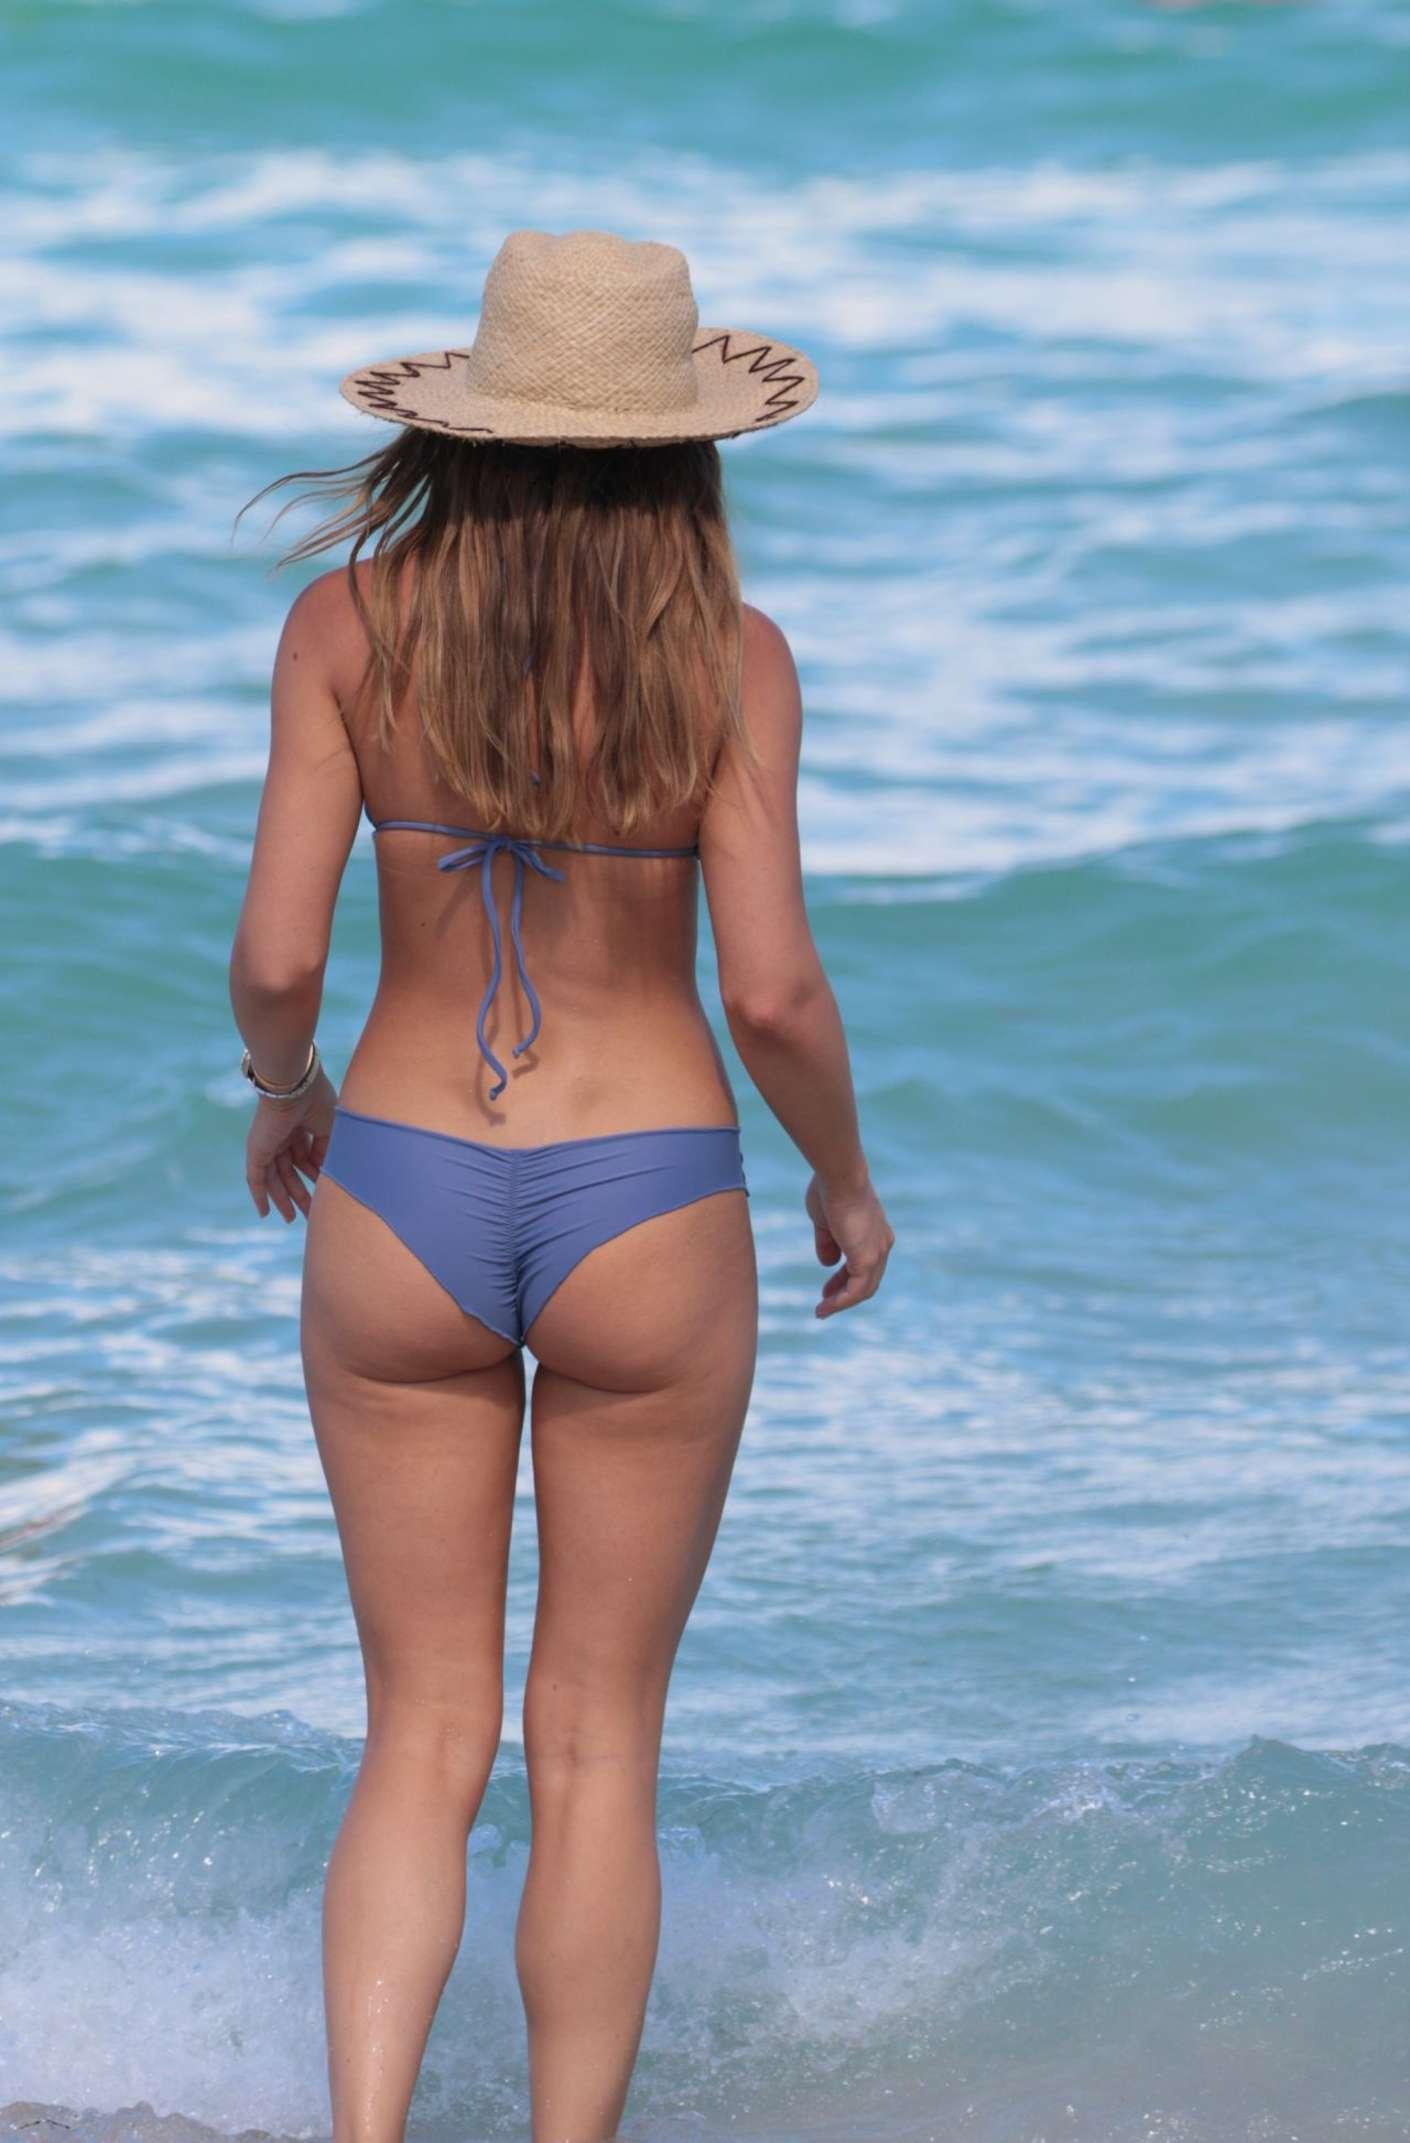 Keleigh Sperry in Black Bikini -07   GotCeleb